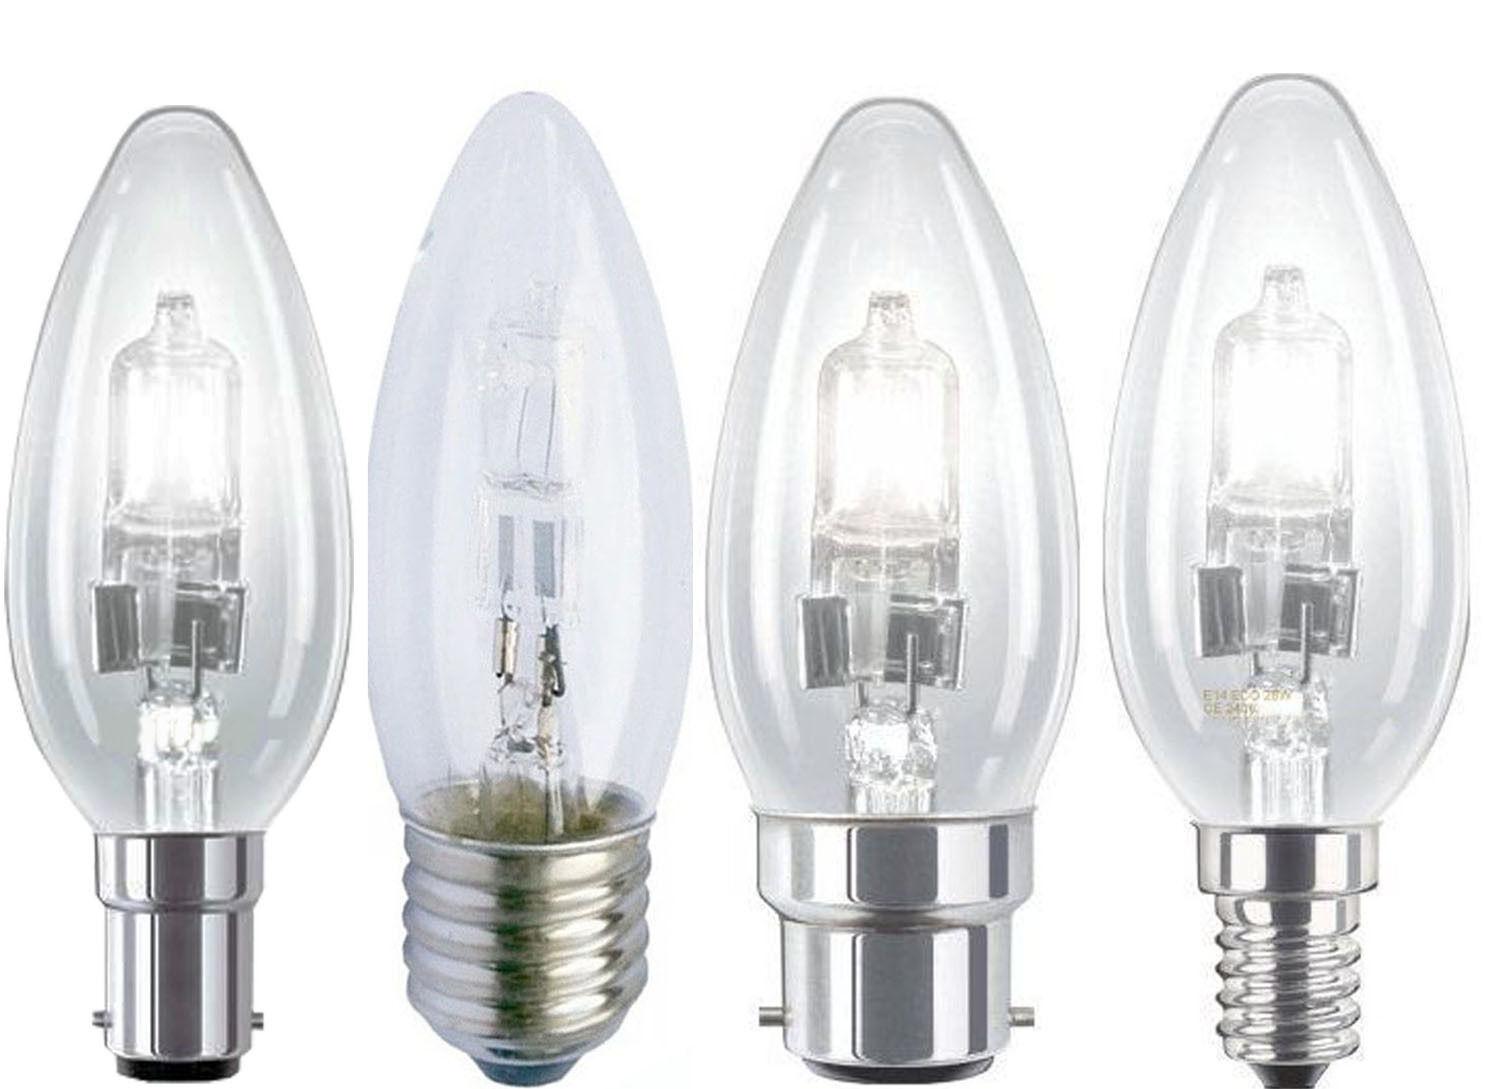 Light Bulbs Lighting 10 x 25w Watt B15 B15d Clear Bayonet Cap Base Fitting Dimmable Candle Bulb Bulbs